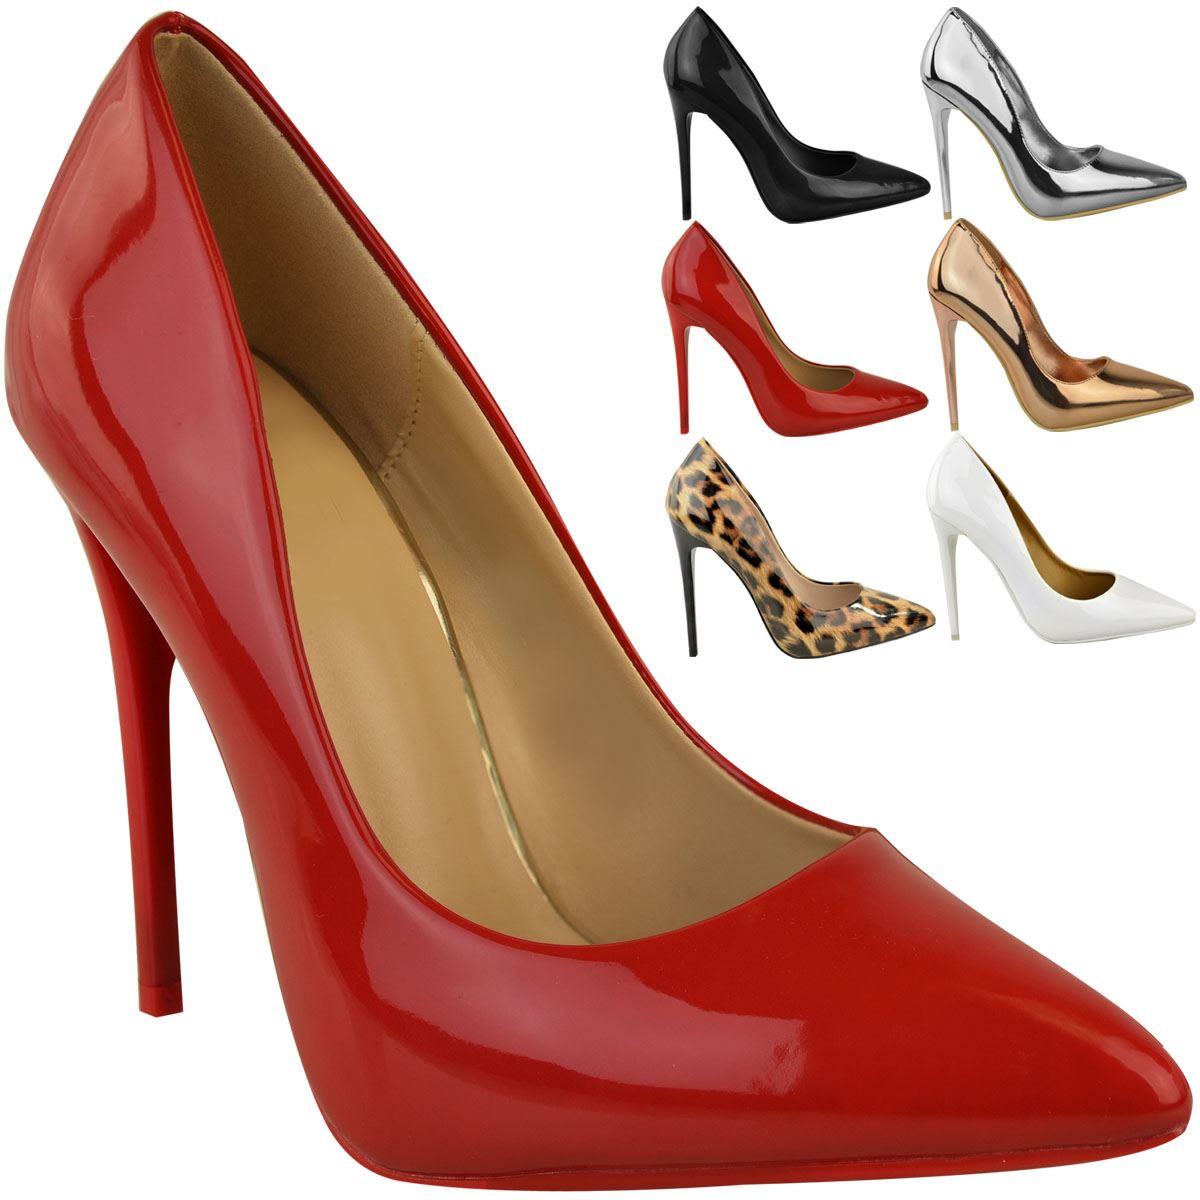 Para-mujeres-Damas-Negro-Tacon-Alto-Zapatos-Tribunal-Inteligente-Ocasion-Formal-Talla-De-Fiesta